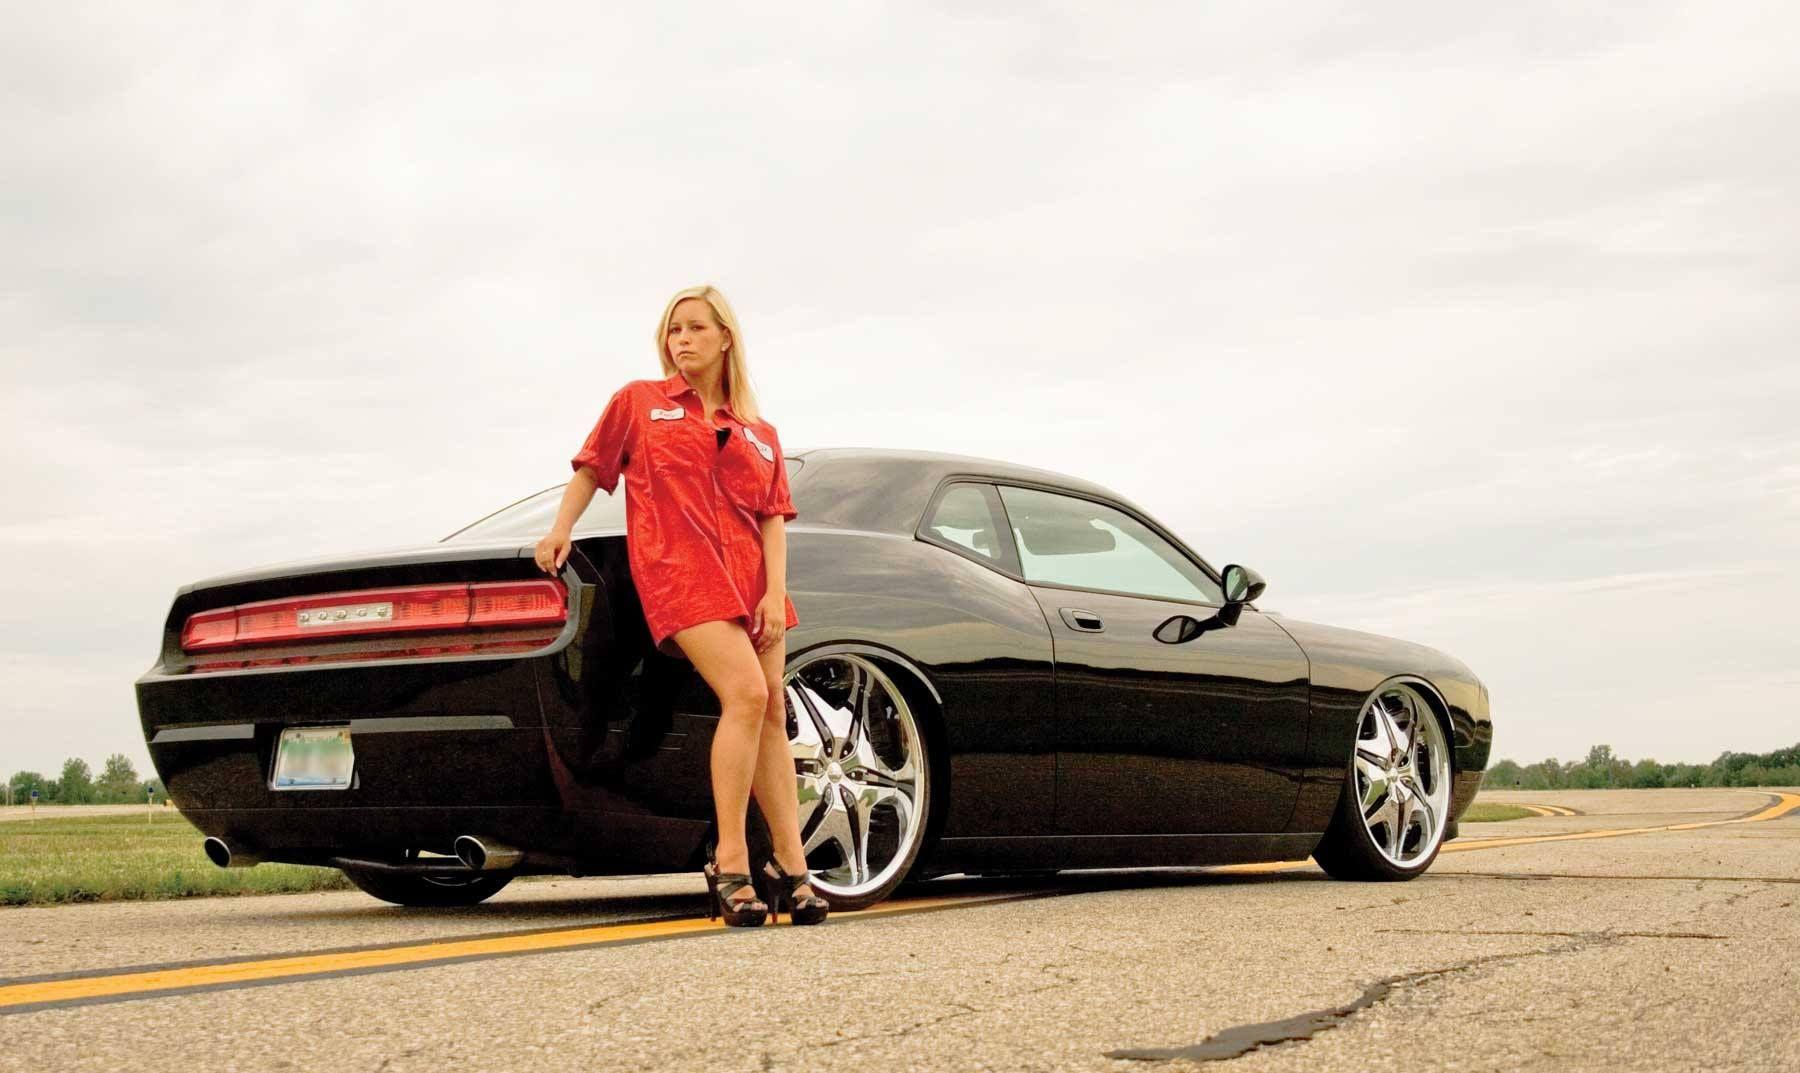 Dodge Challenger And Girl Supercar Dodge Musclecar Super